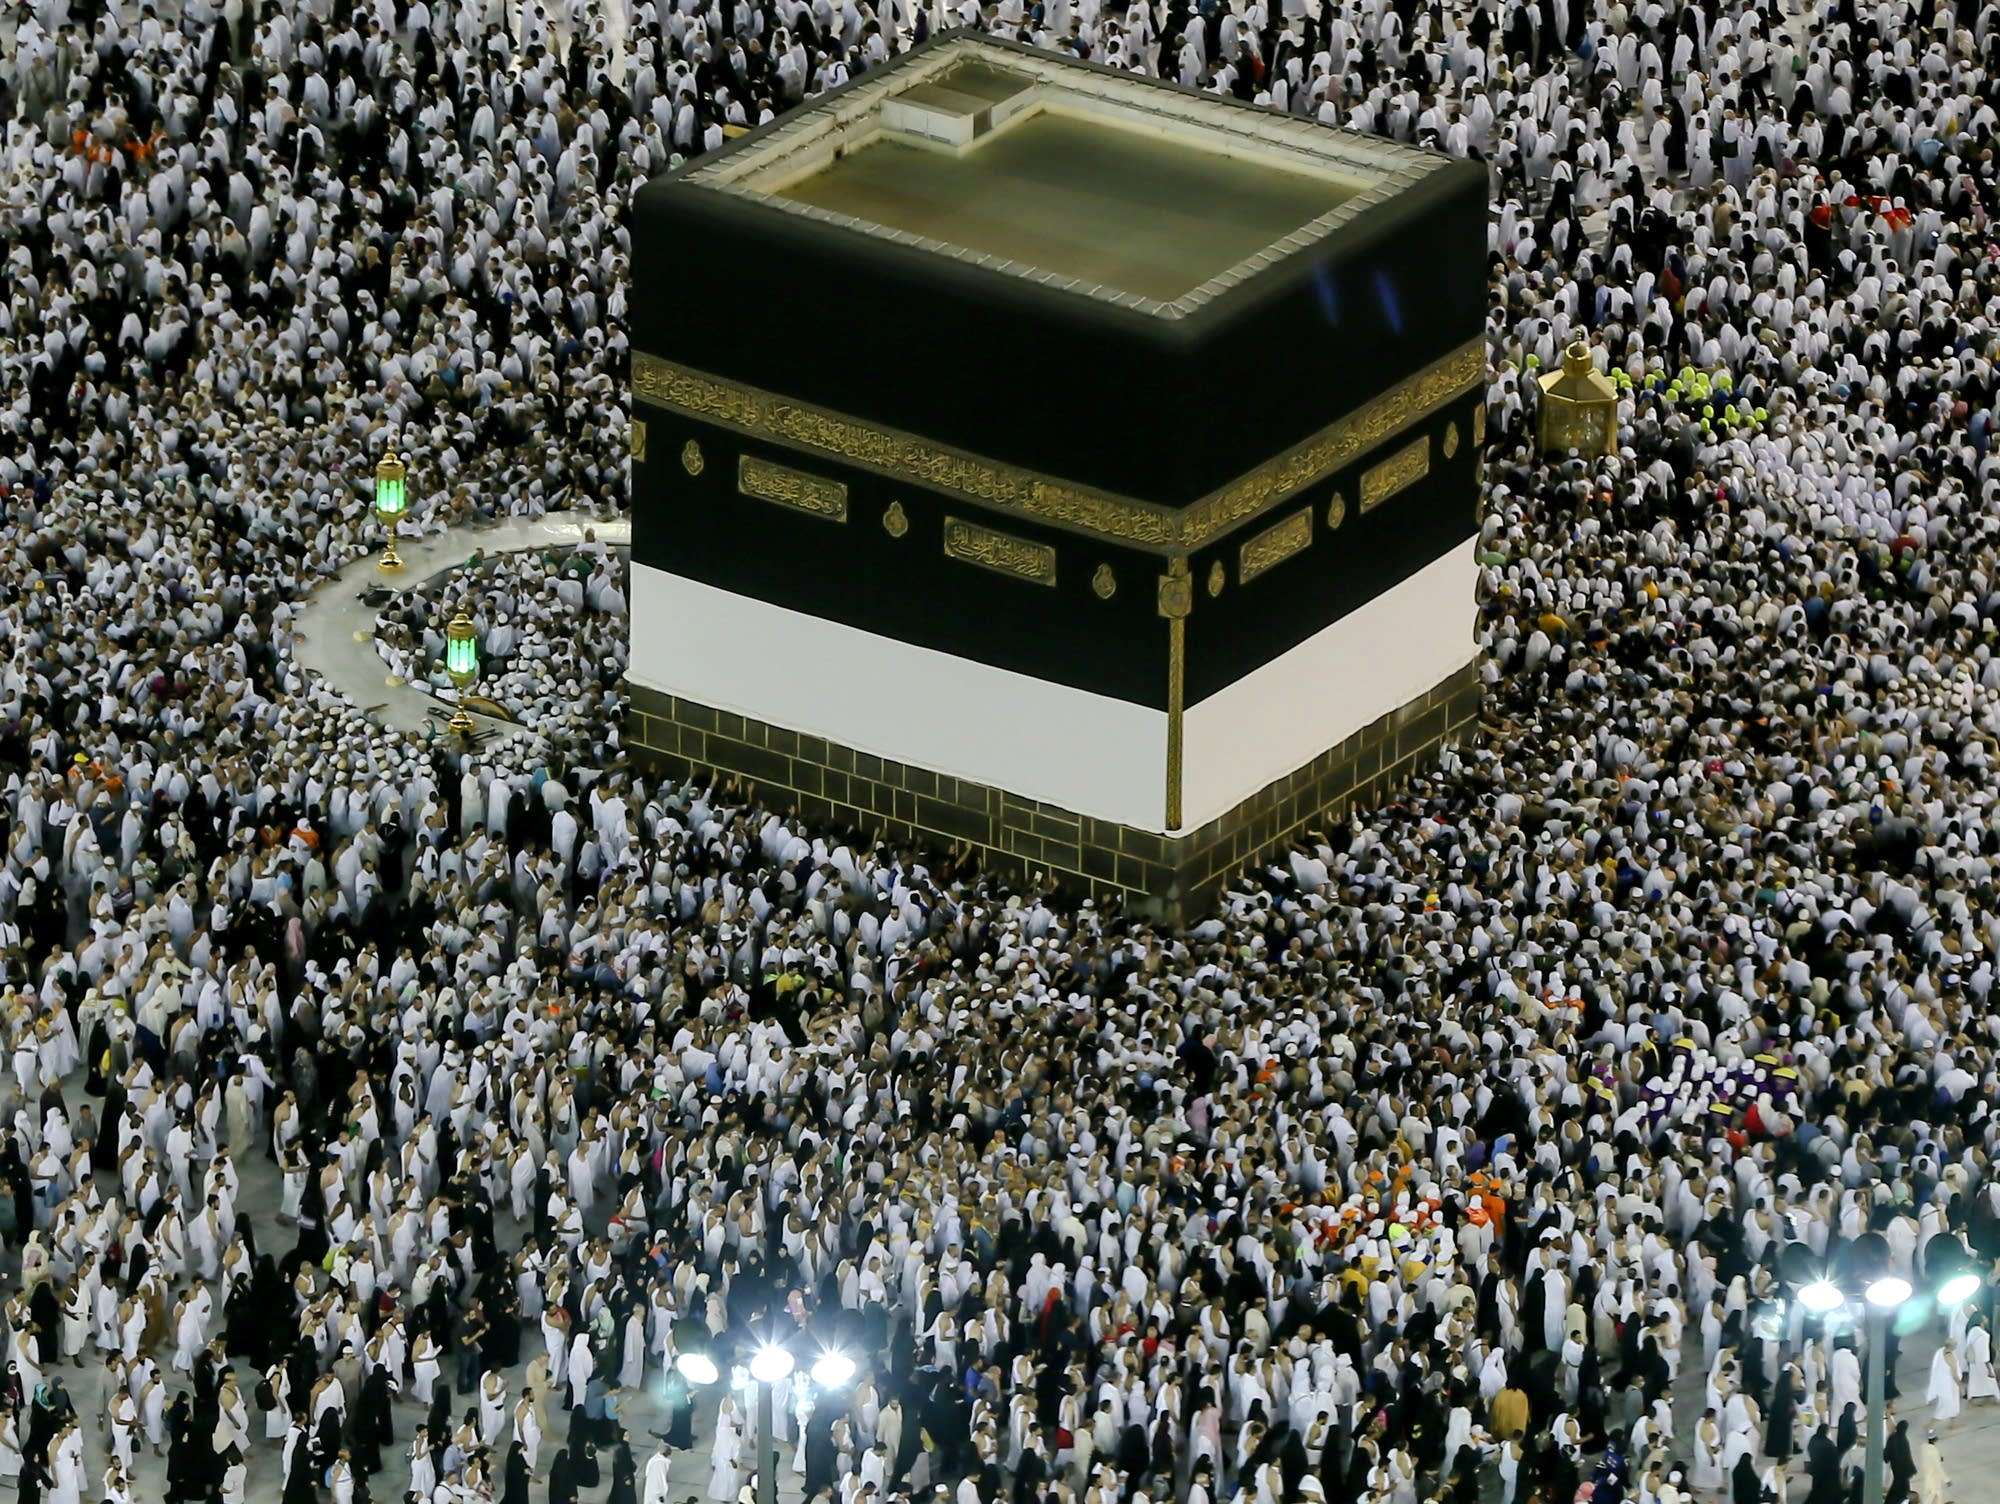 Over 2 million Muslims begin annual hajj pilgrimage | MPR News